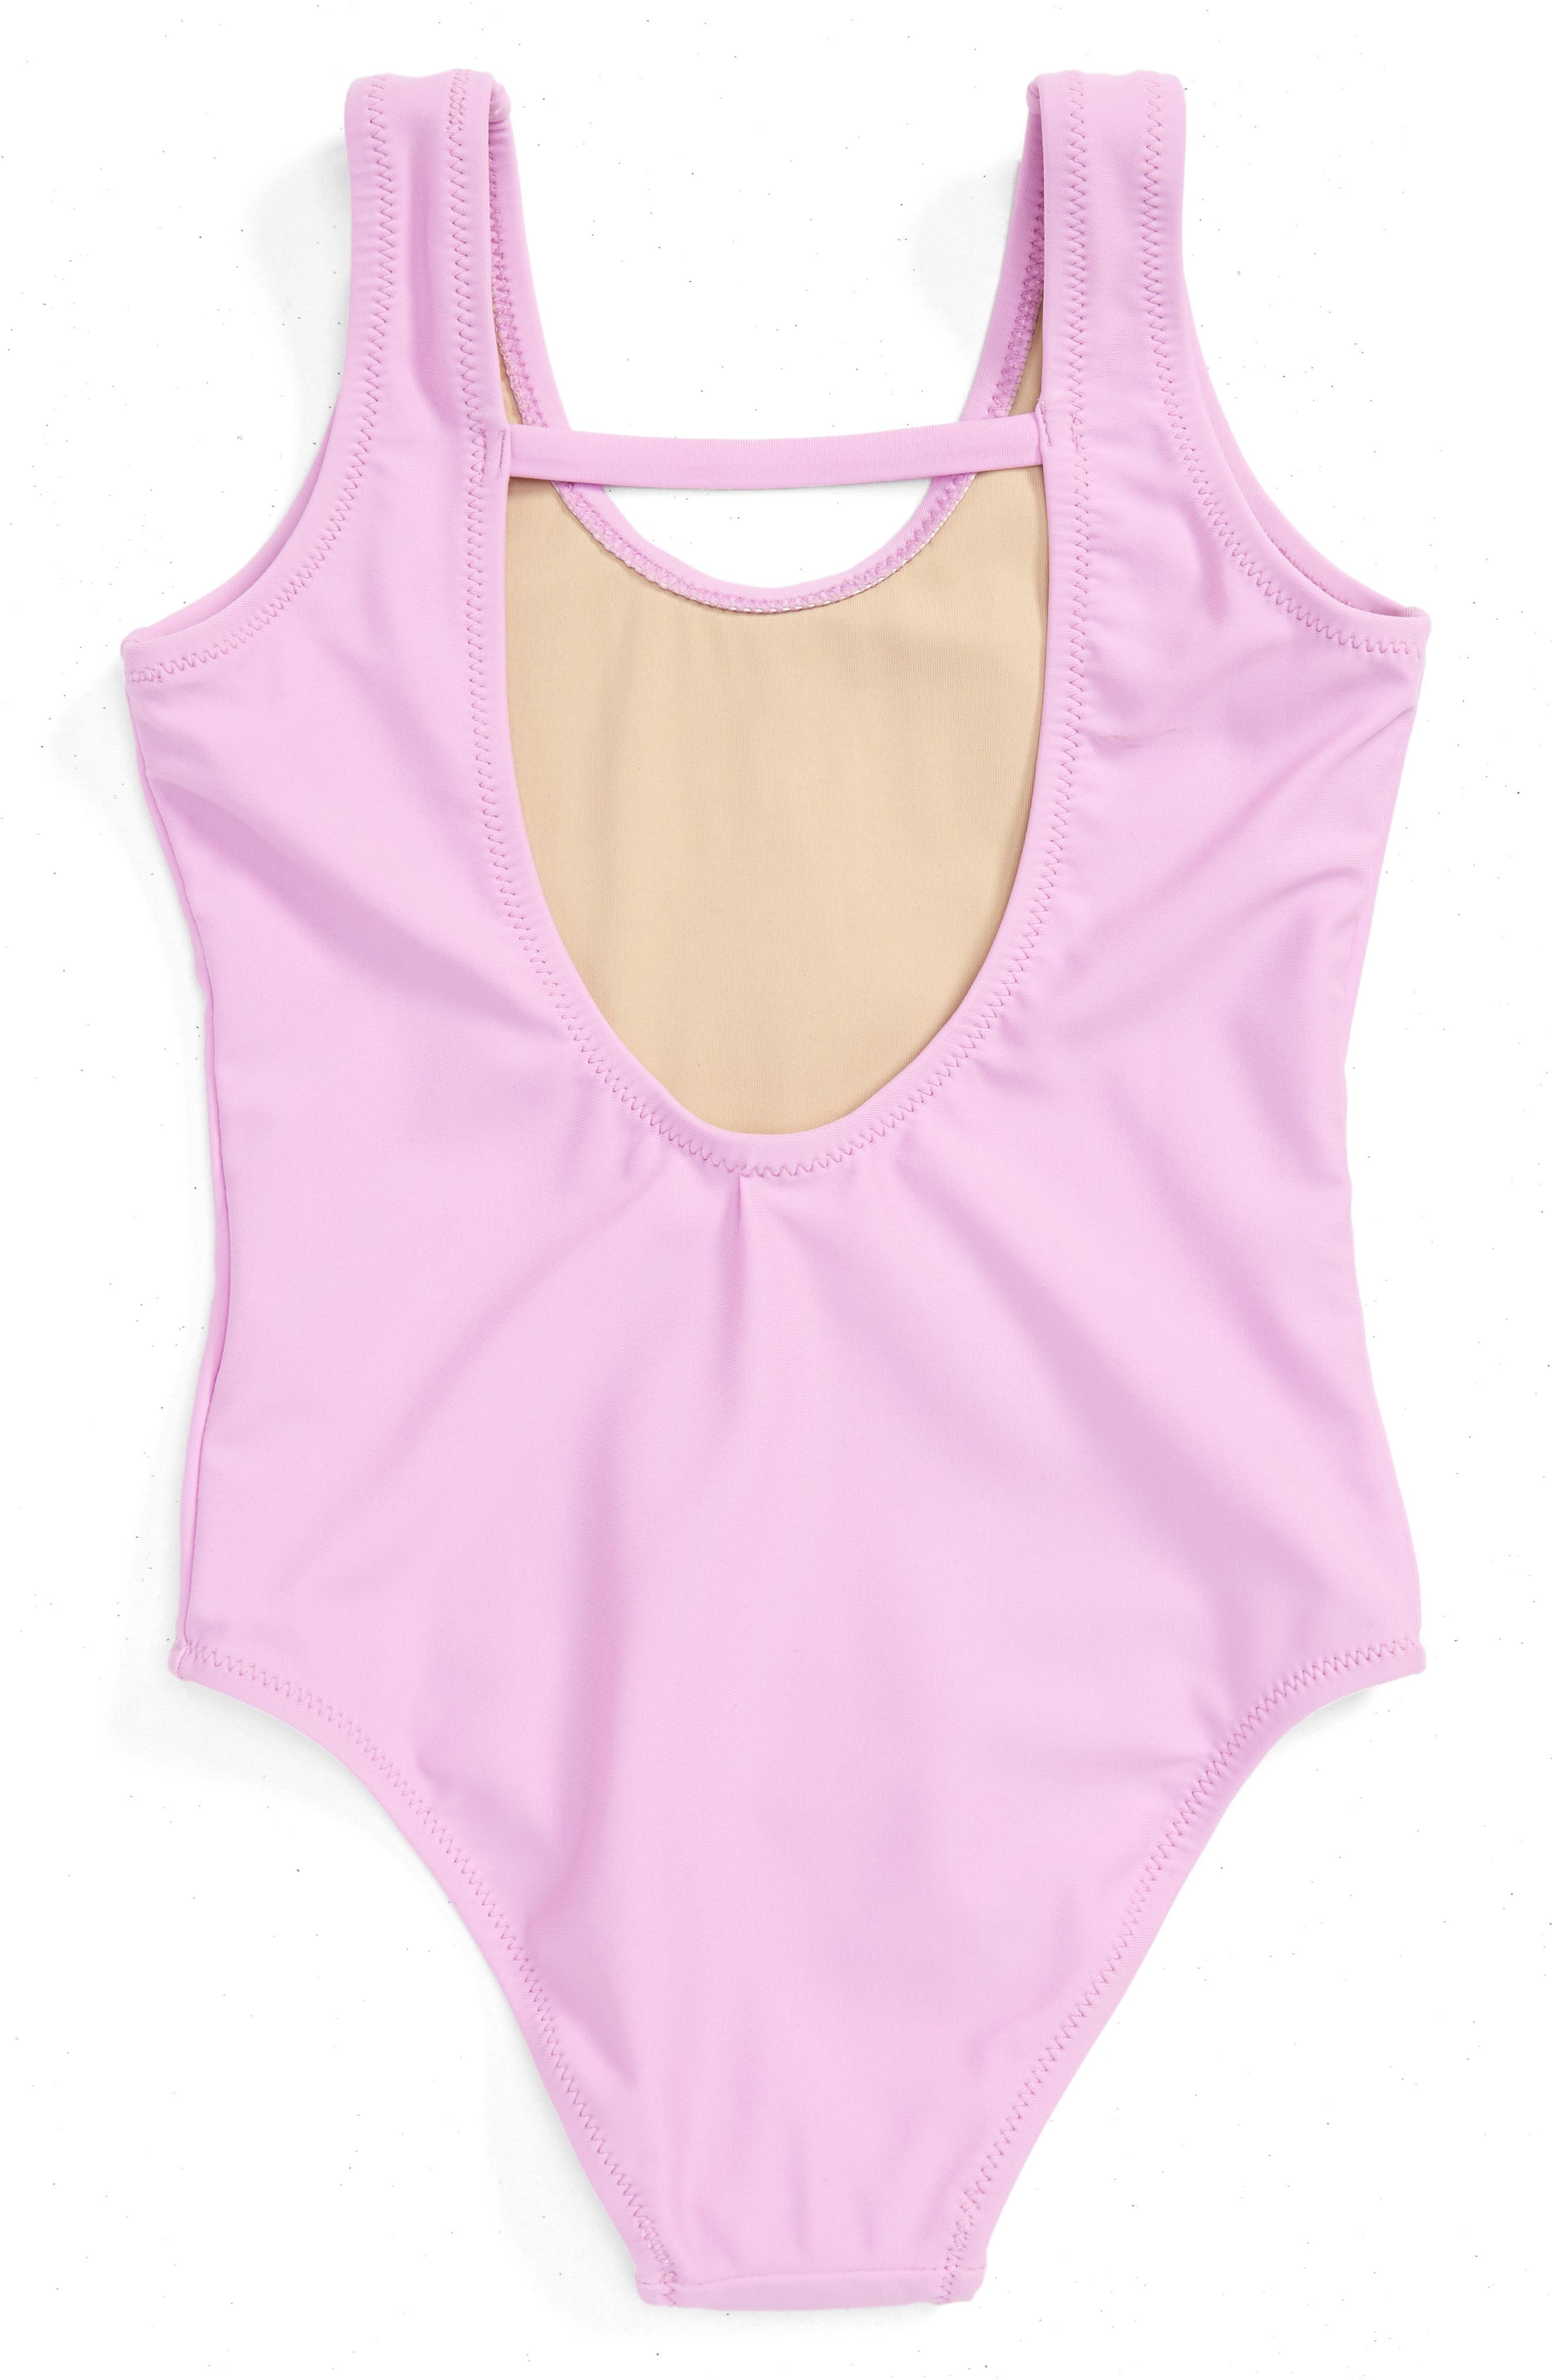 Lifeguard One-Piece Swimsuit,                         Main,                         color, 500